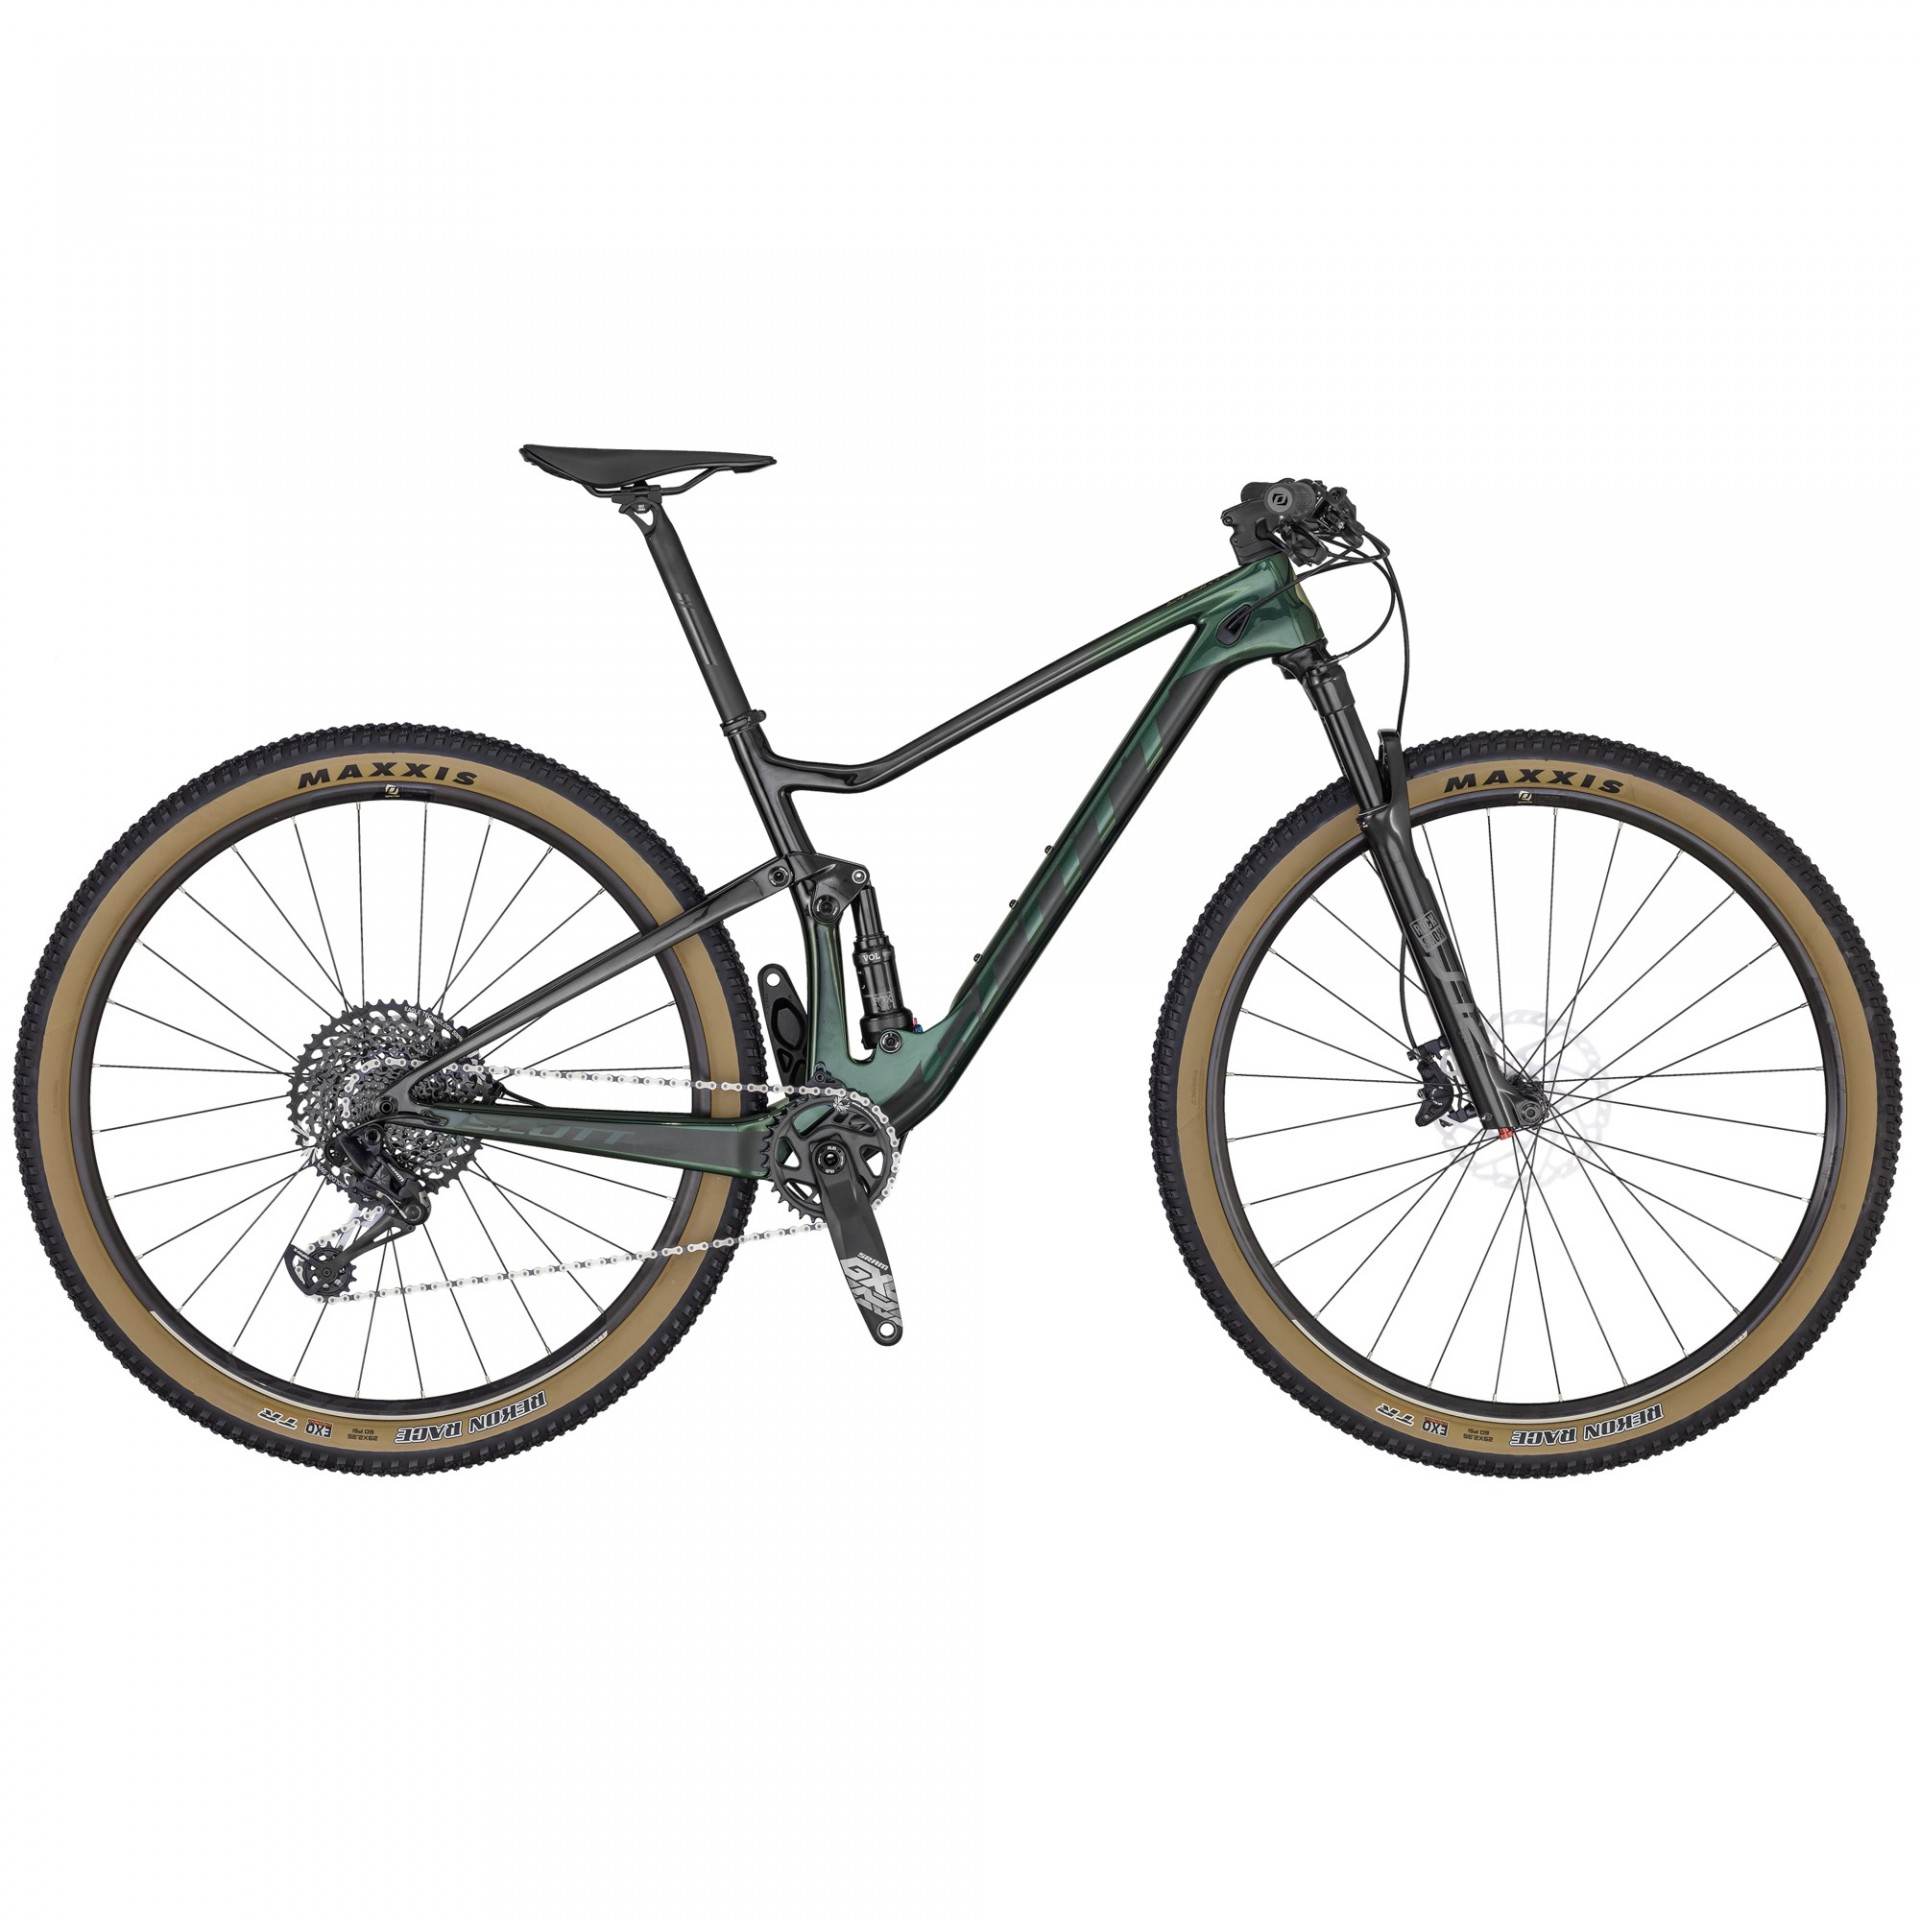 BICICLETA SCOTT SPARK RC 900 TEAM GREEN - 2020